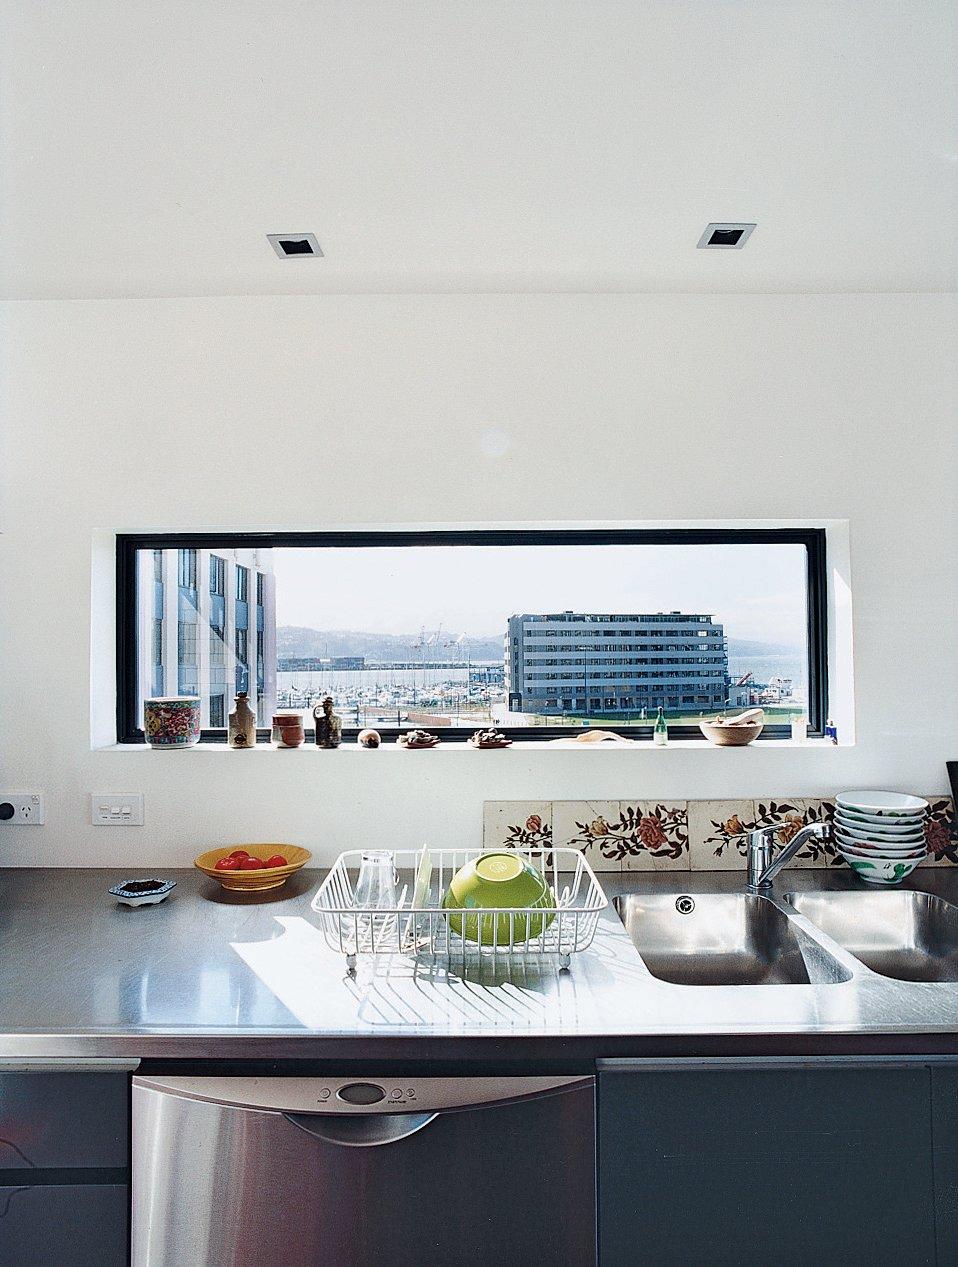 Photo 2 Of 10 In Rising Above It All Kitchen Interior Diy Window Over Sink Modern Interior